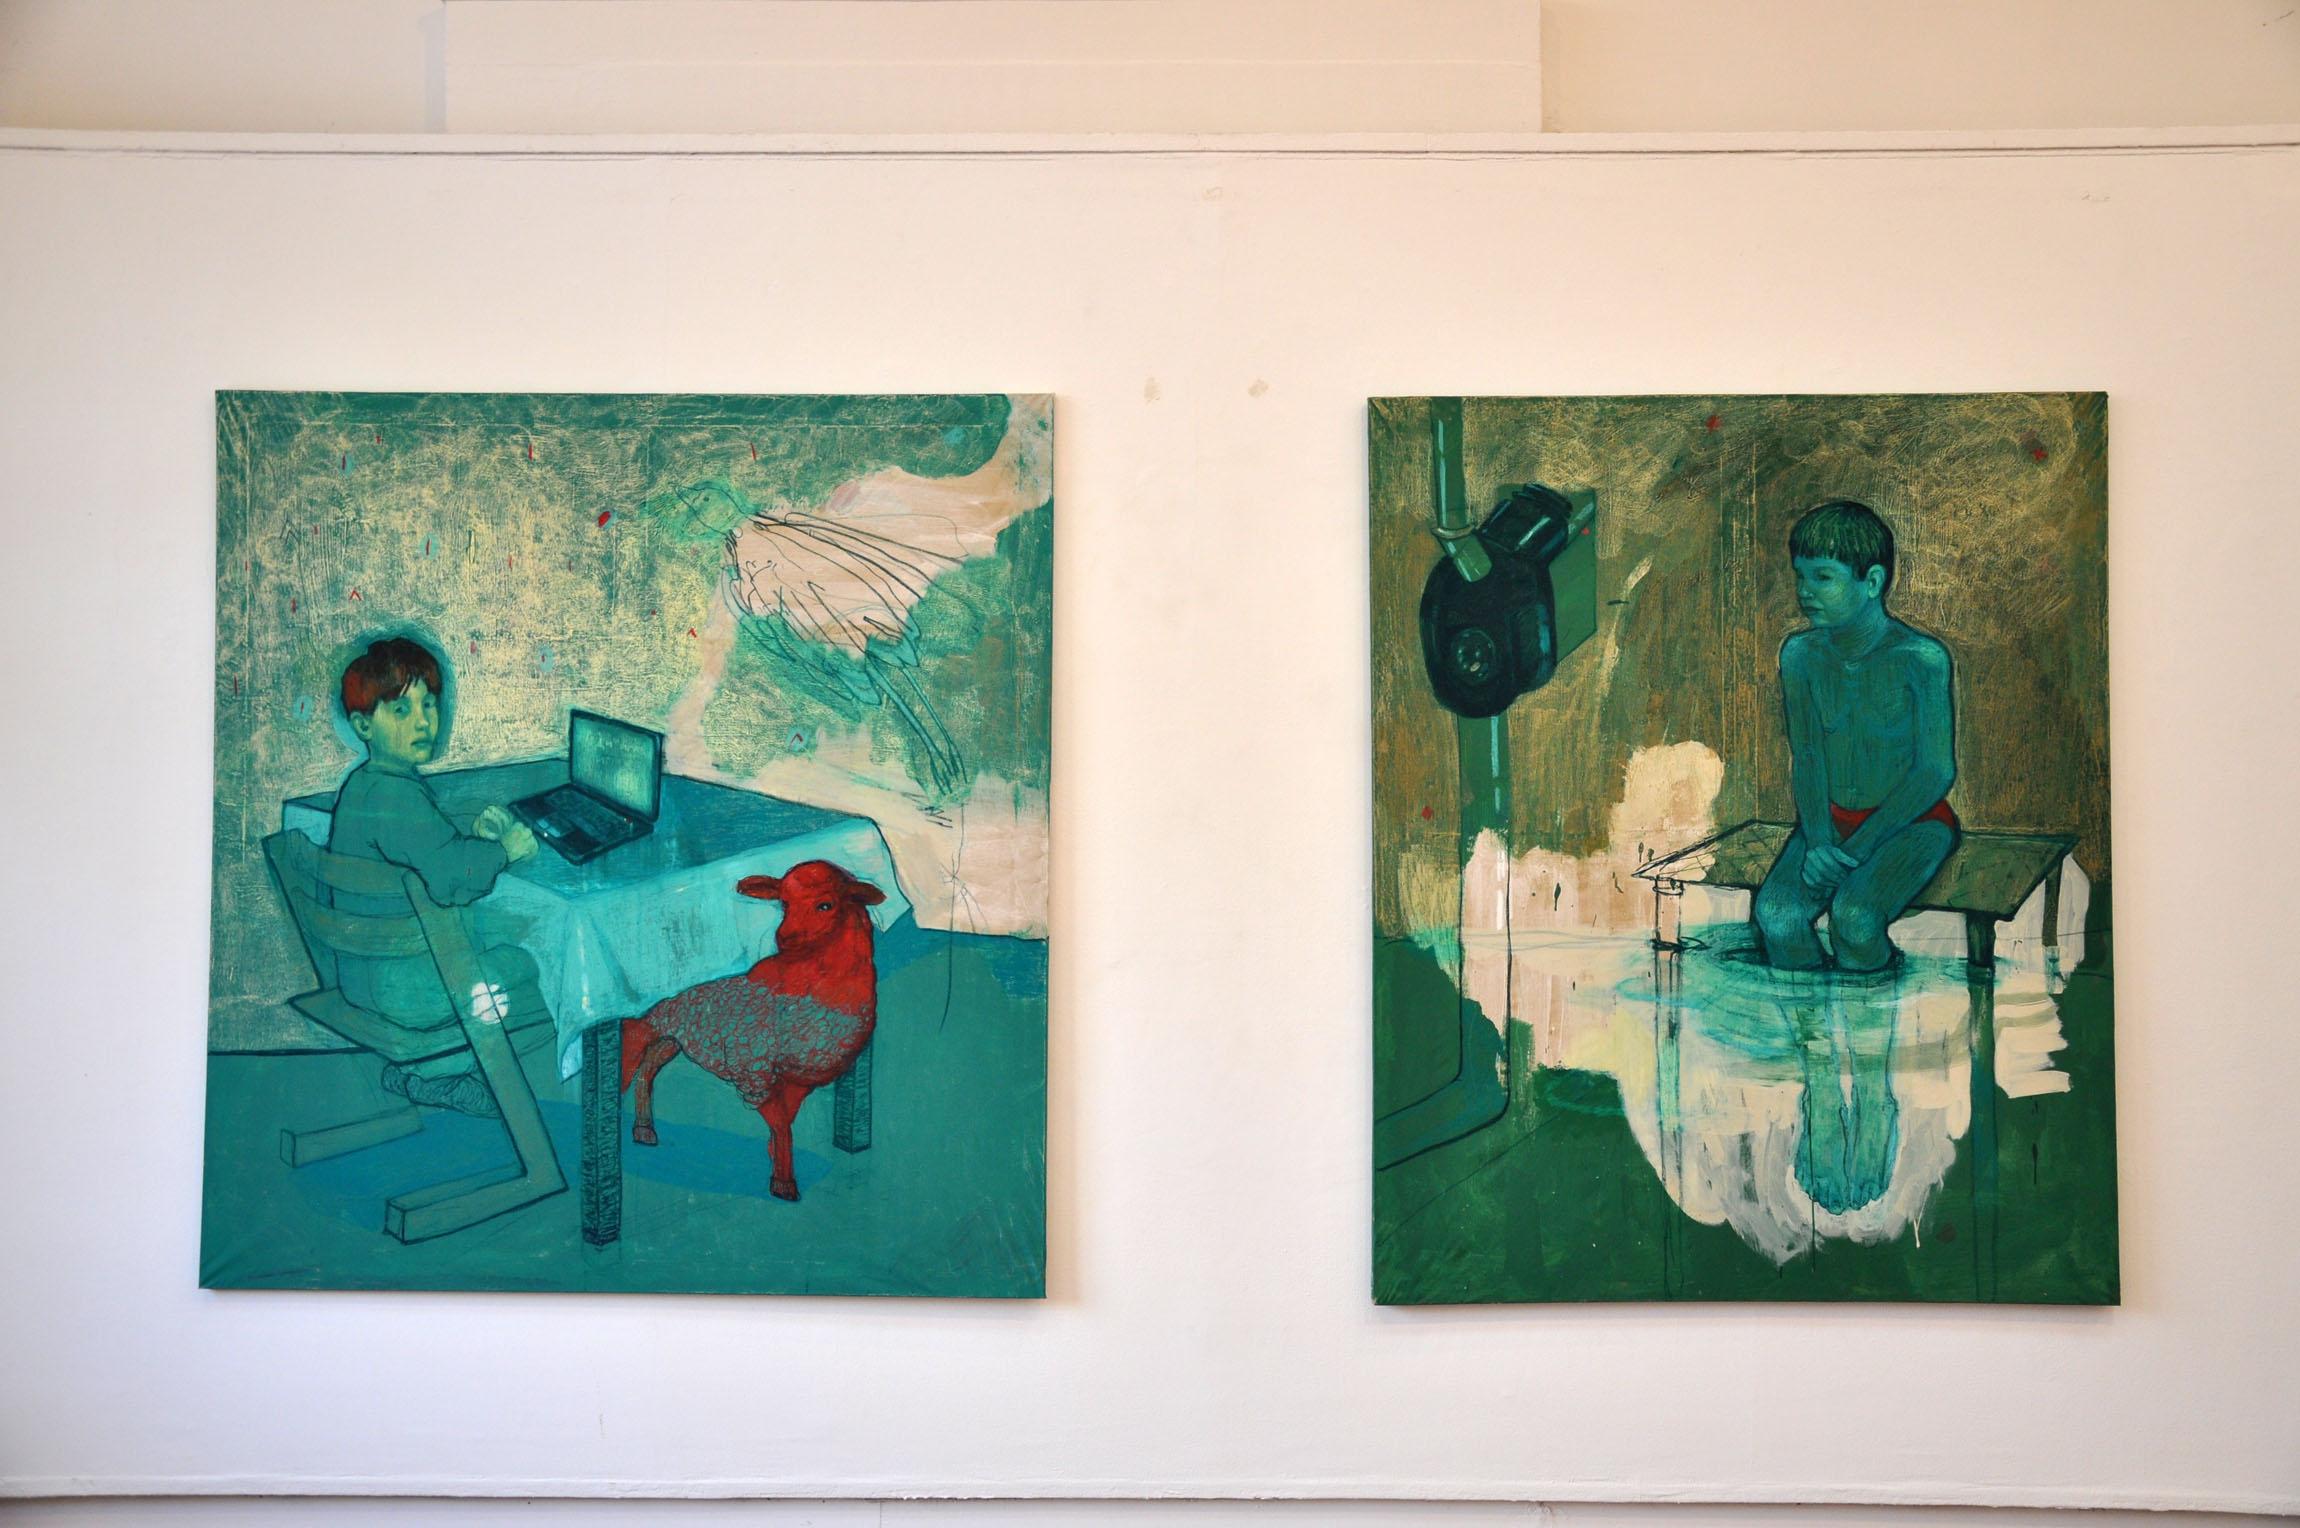 Valedictorian Art Exhibition, Milica Lazarevic